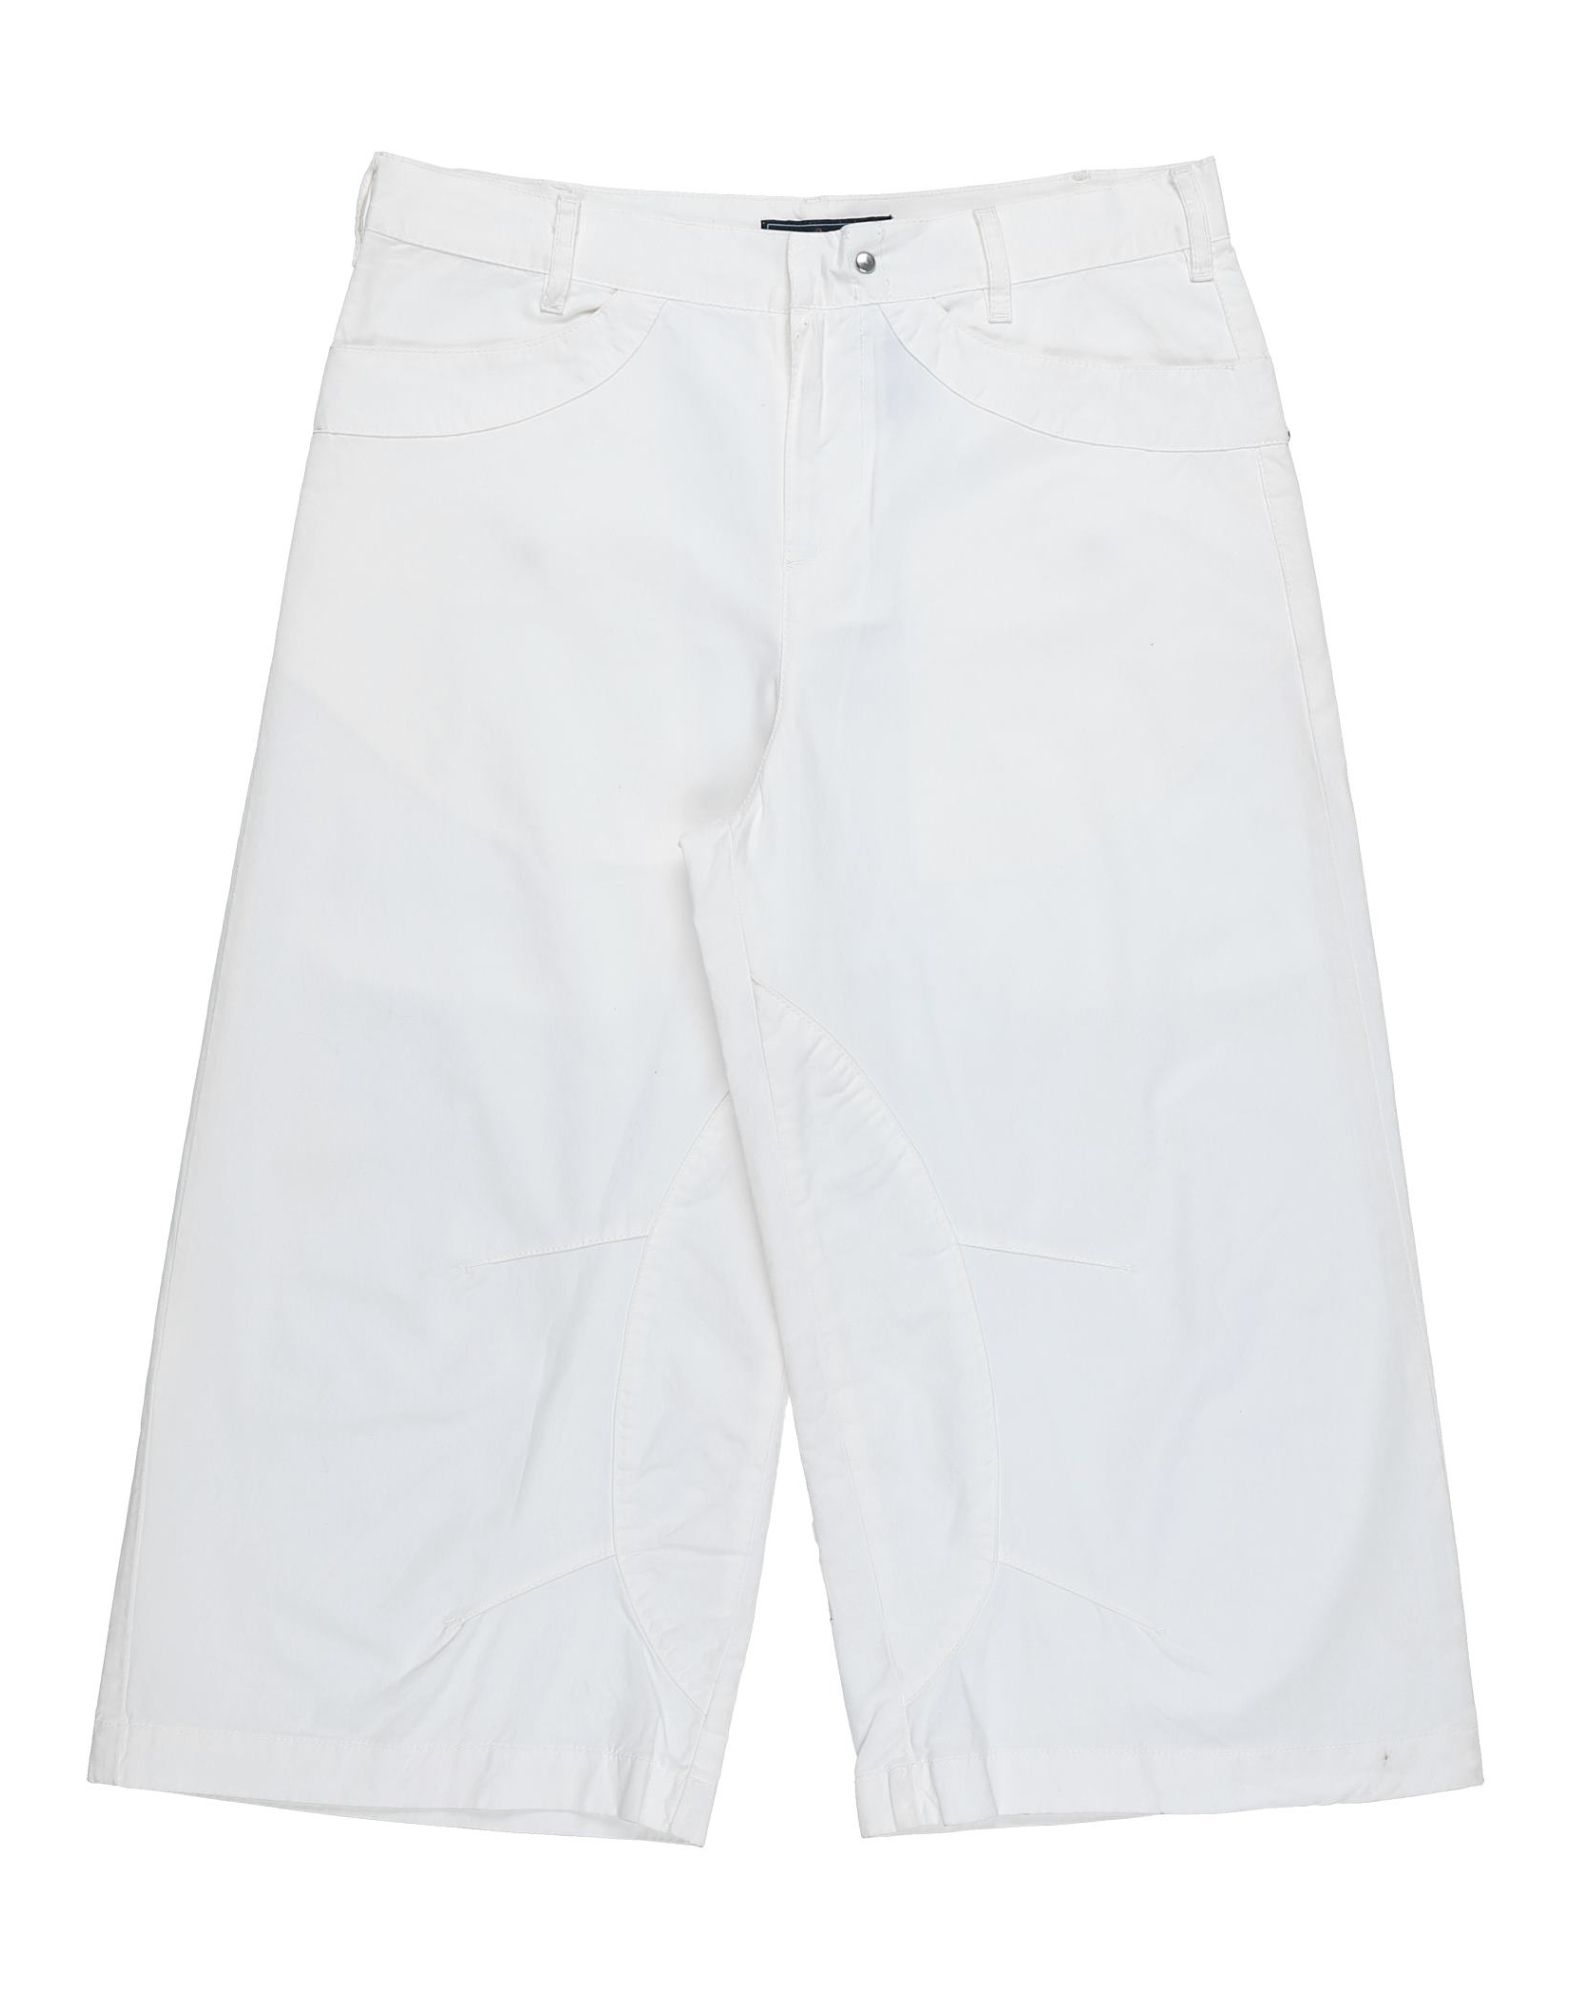 Harmont & Blaine Kids' Bermudas In White